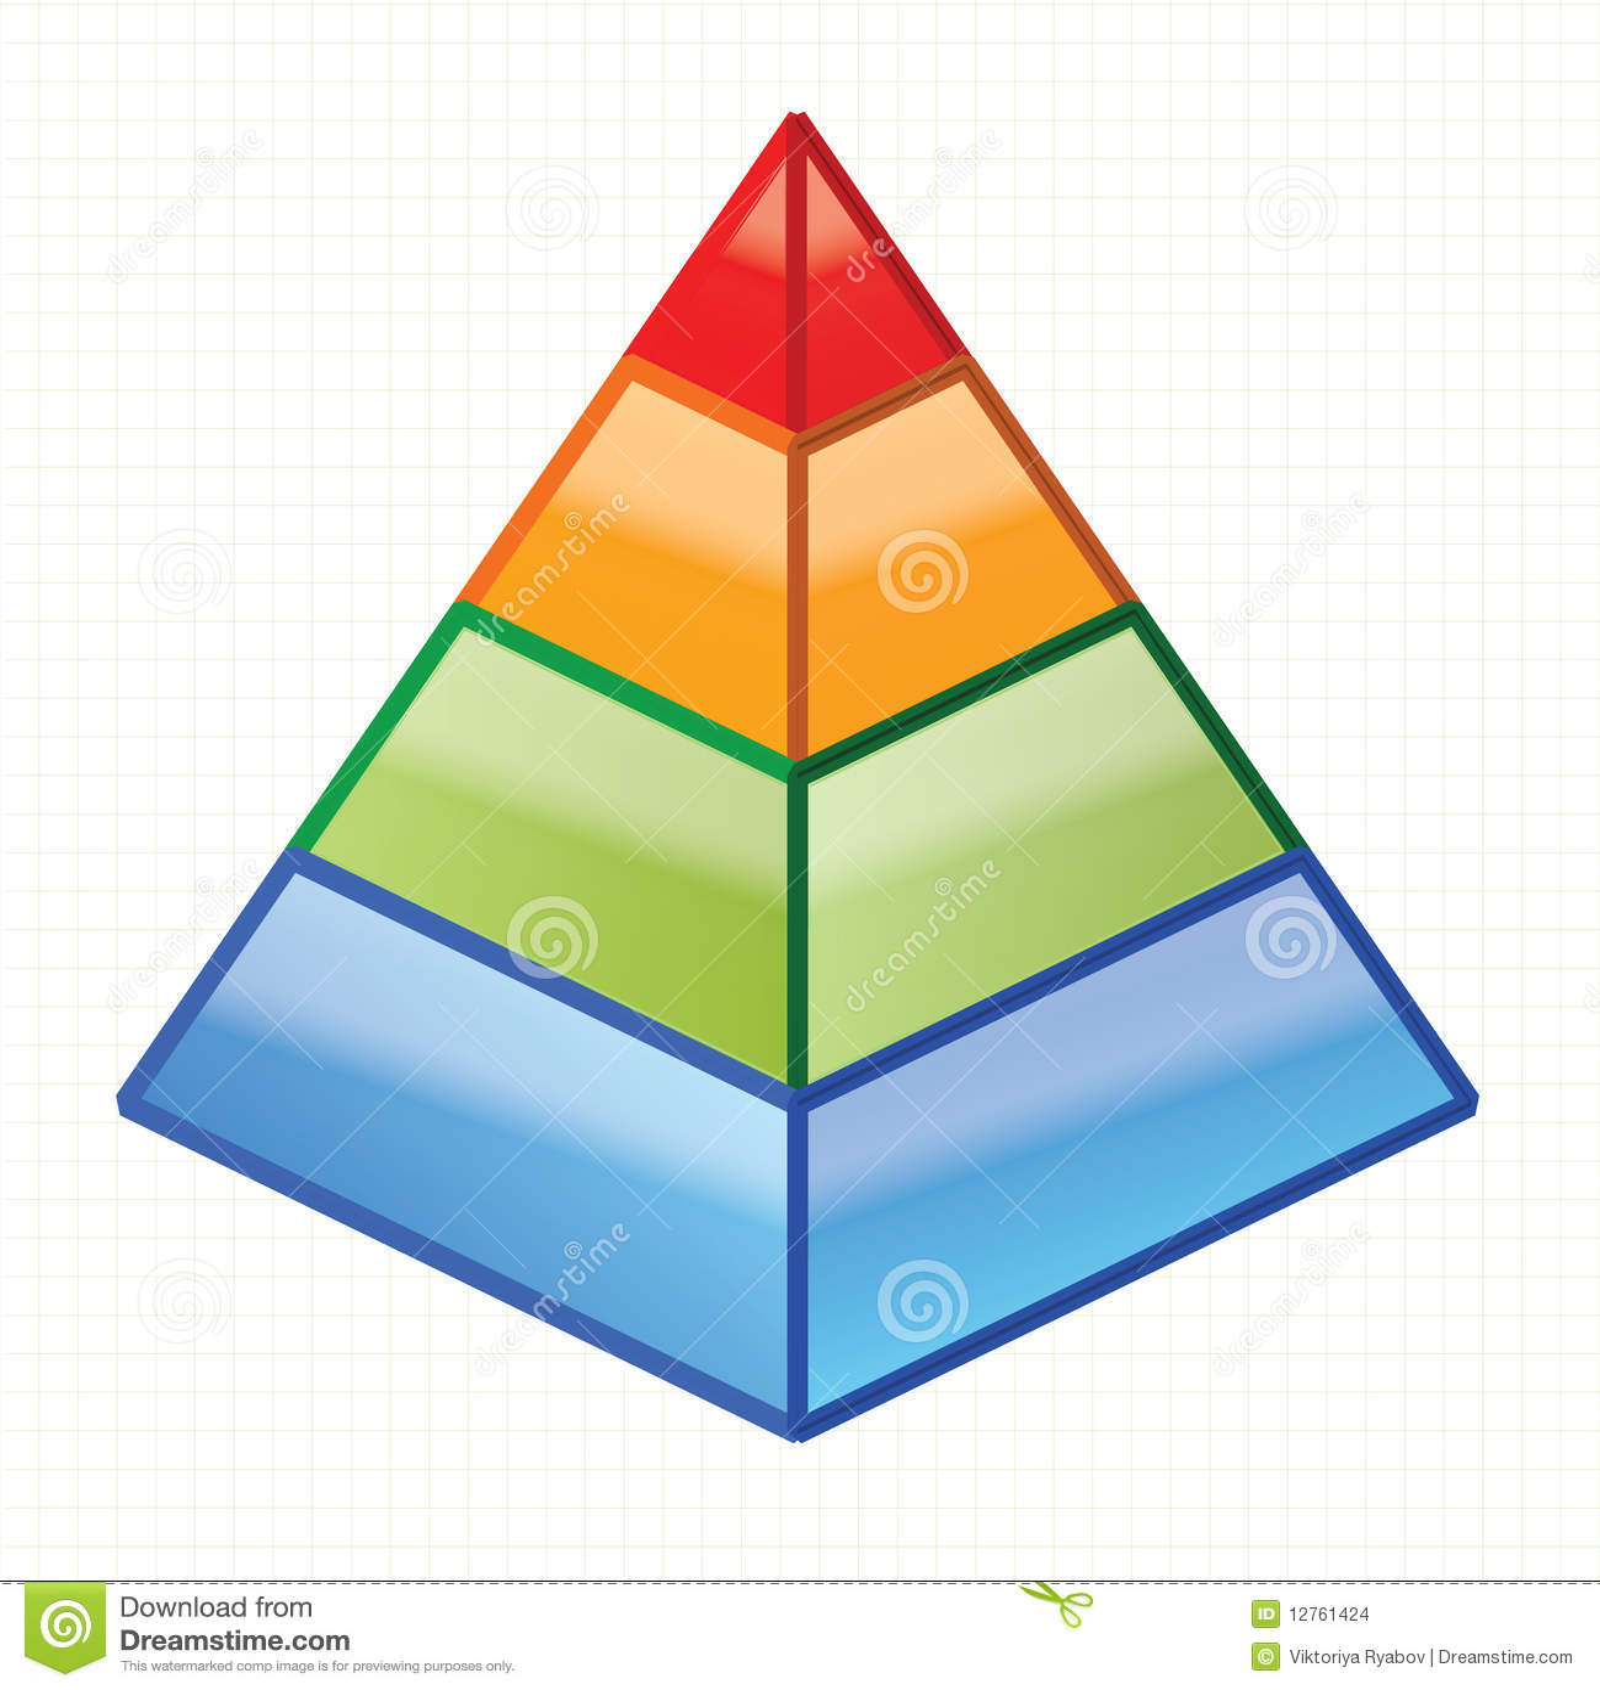 Piramide Stock Images - Image: 12761424